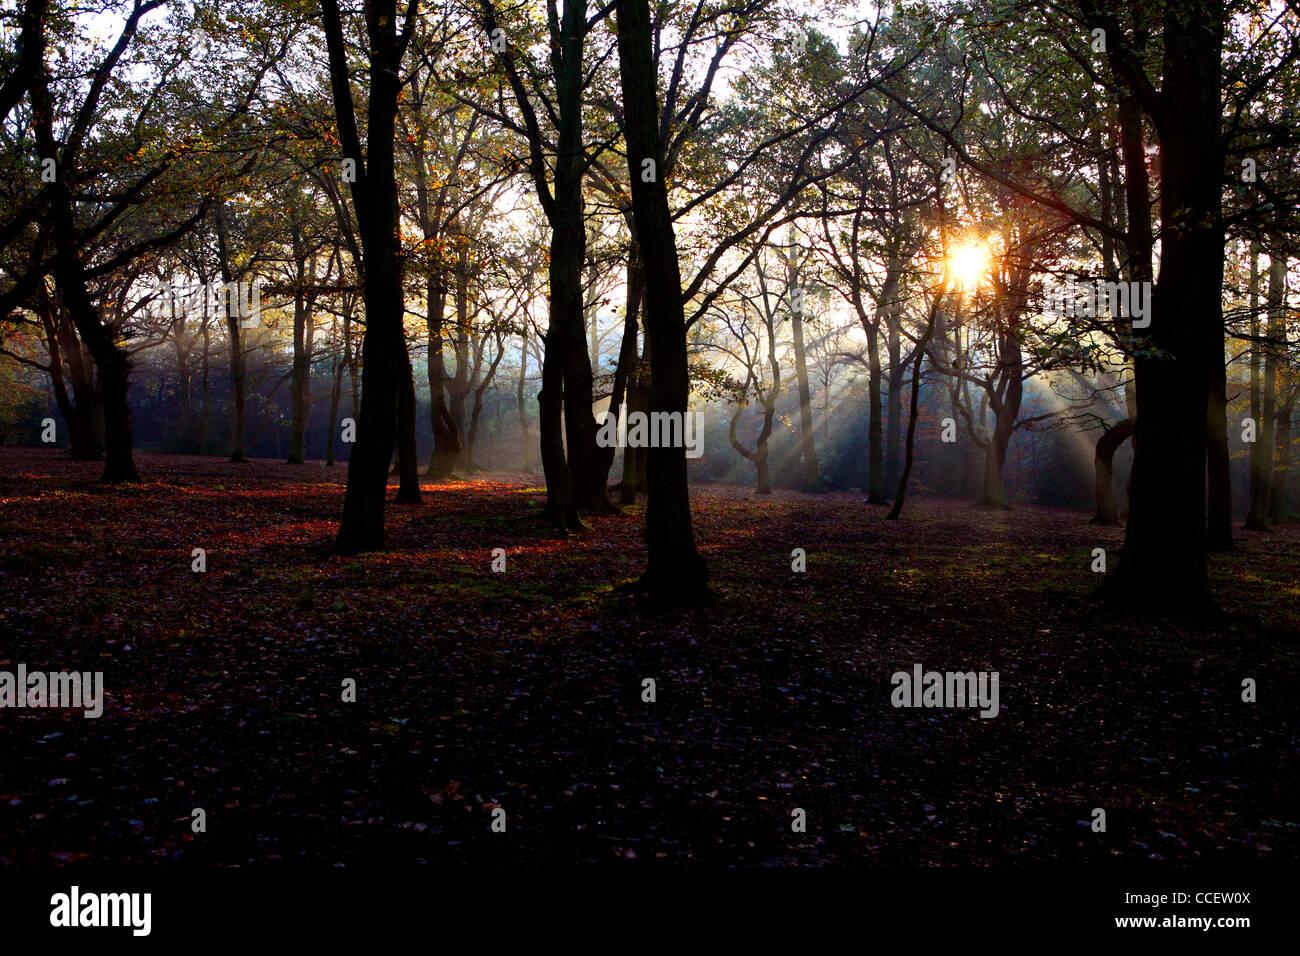 Sun shining through trees in Autumn time - Stock Image